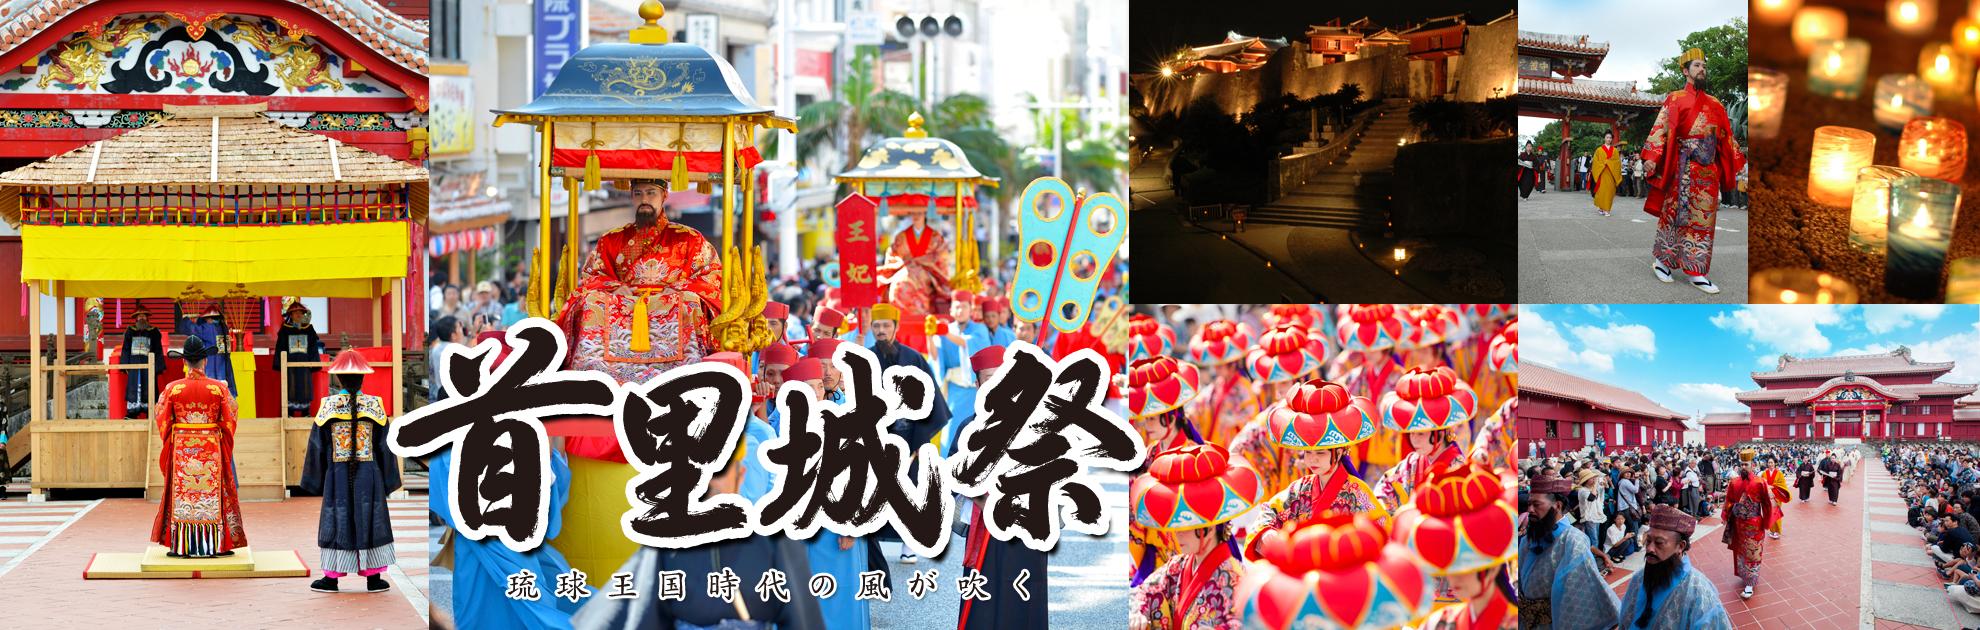 ... which wind of the Shuri Castle Festival - Ryukyu kingdom era blows